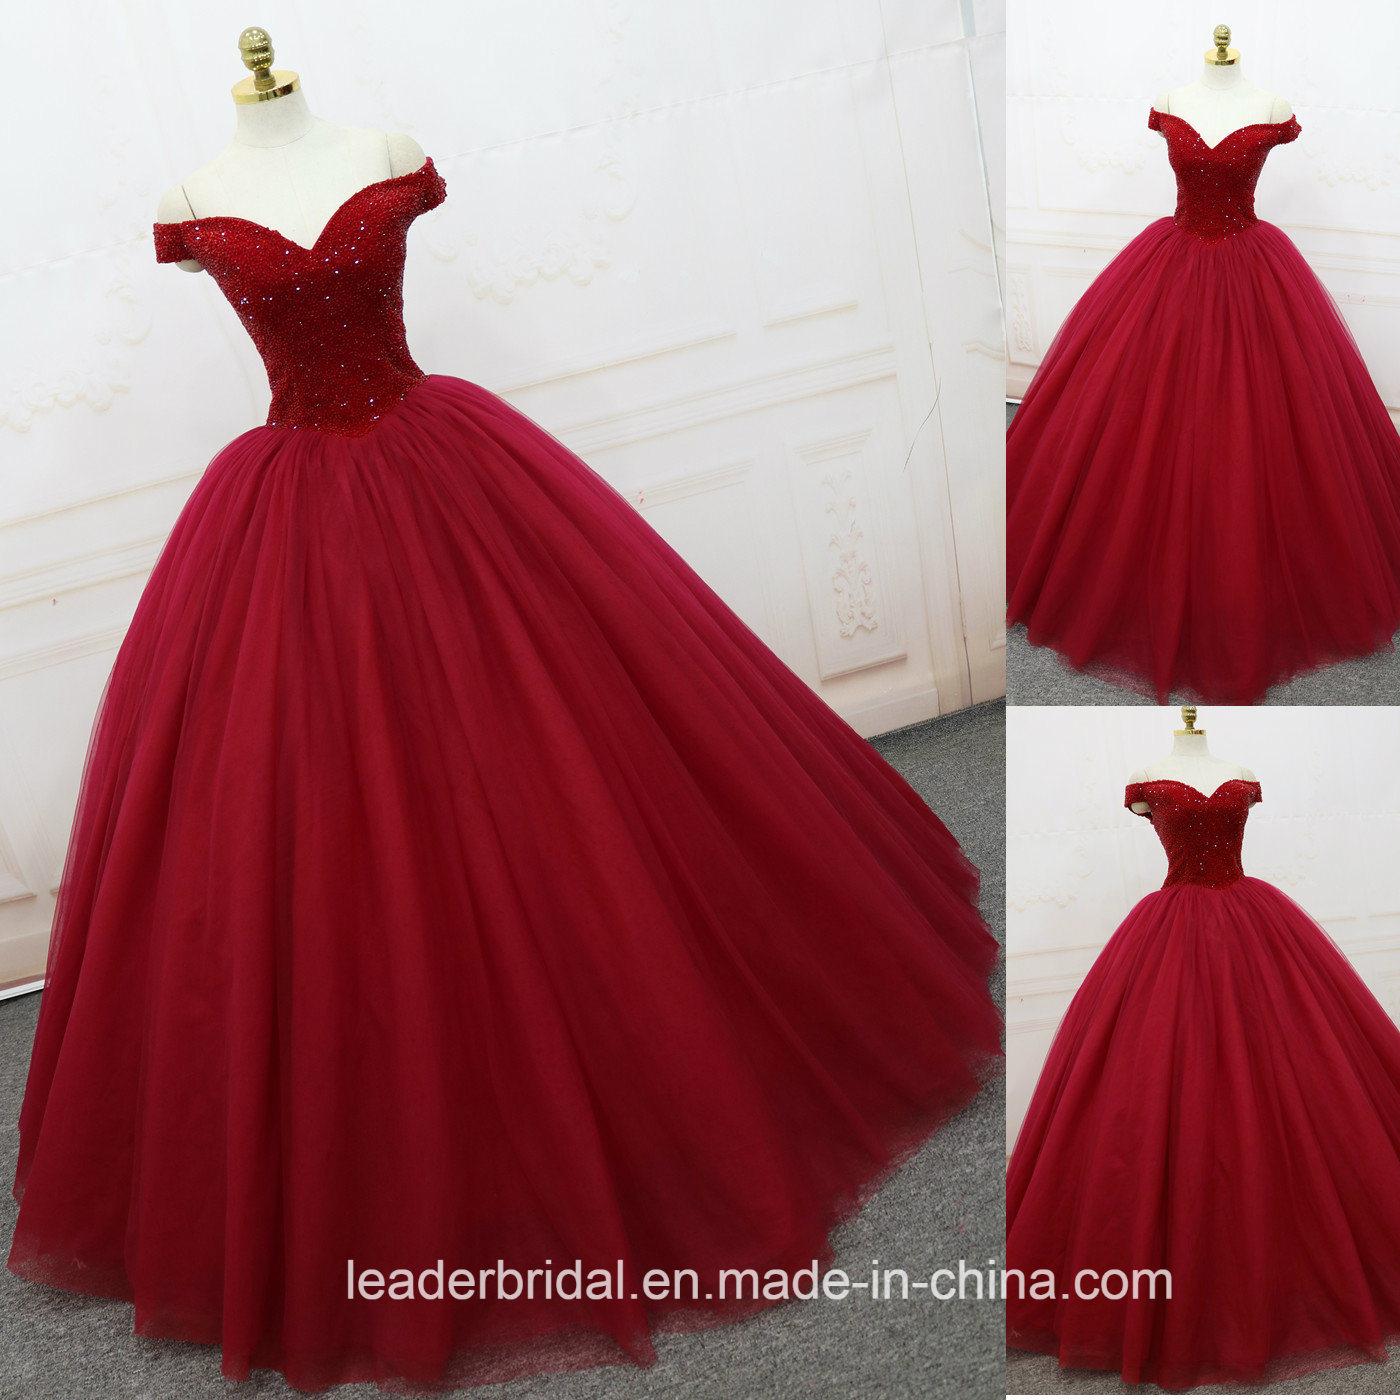 China Red Rhinestones Sweetheart Ball Gowns Luxury